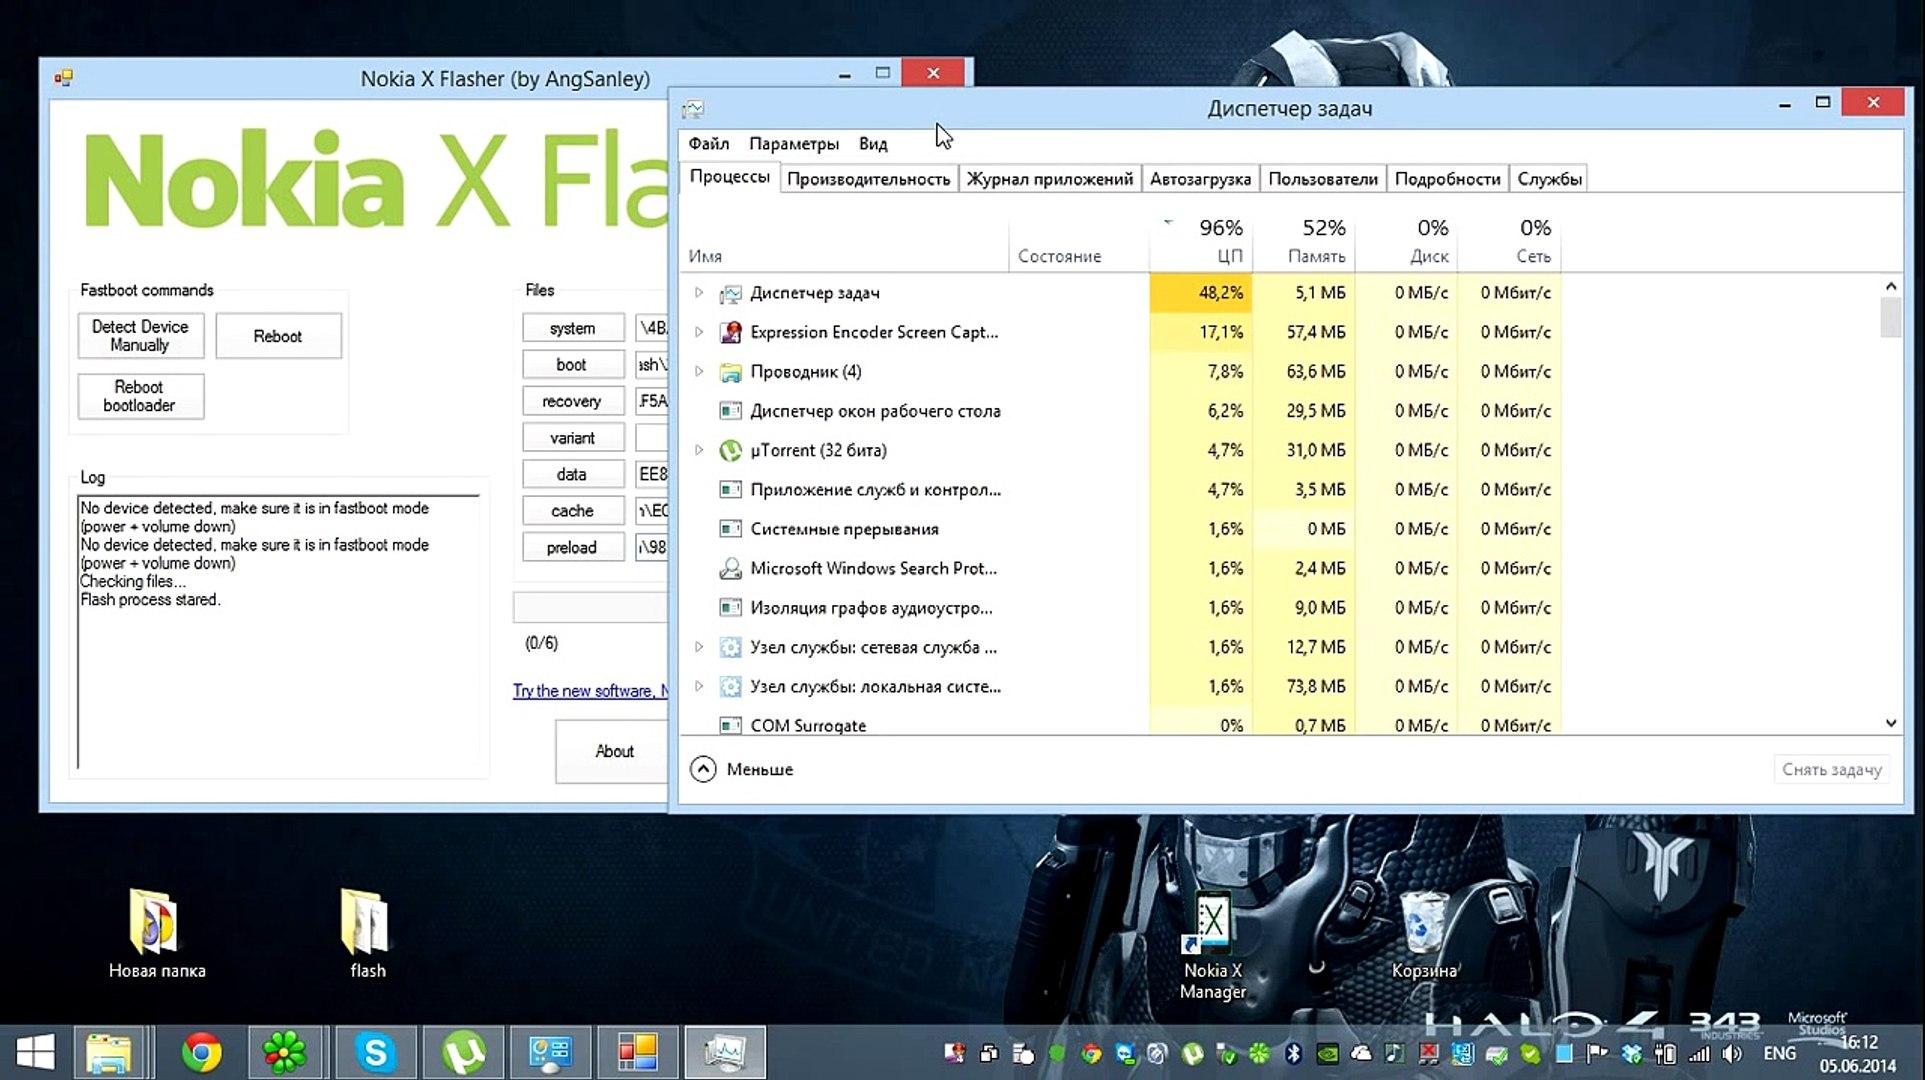 Nokia X Flash stock ROM with NX Flasher